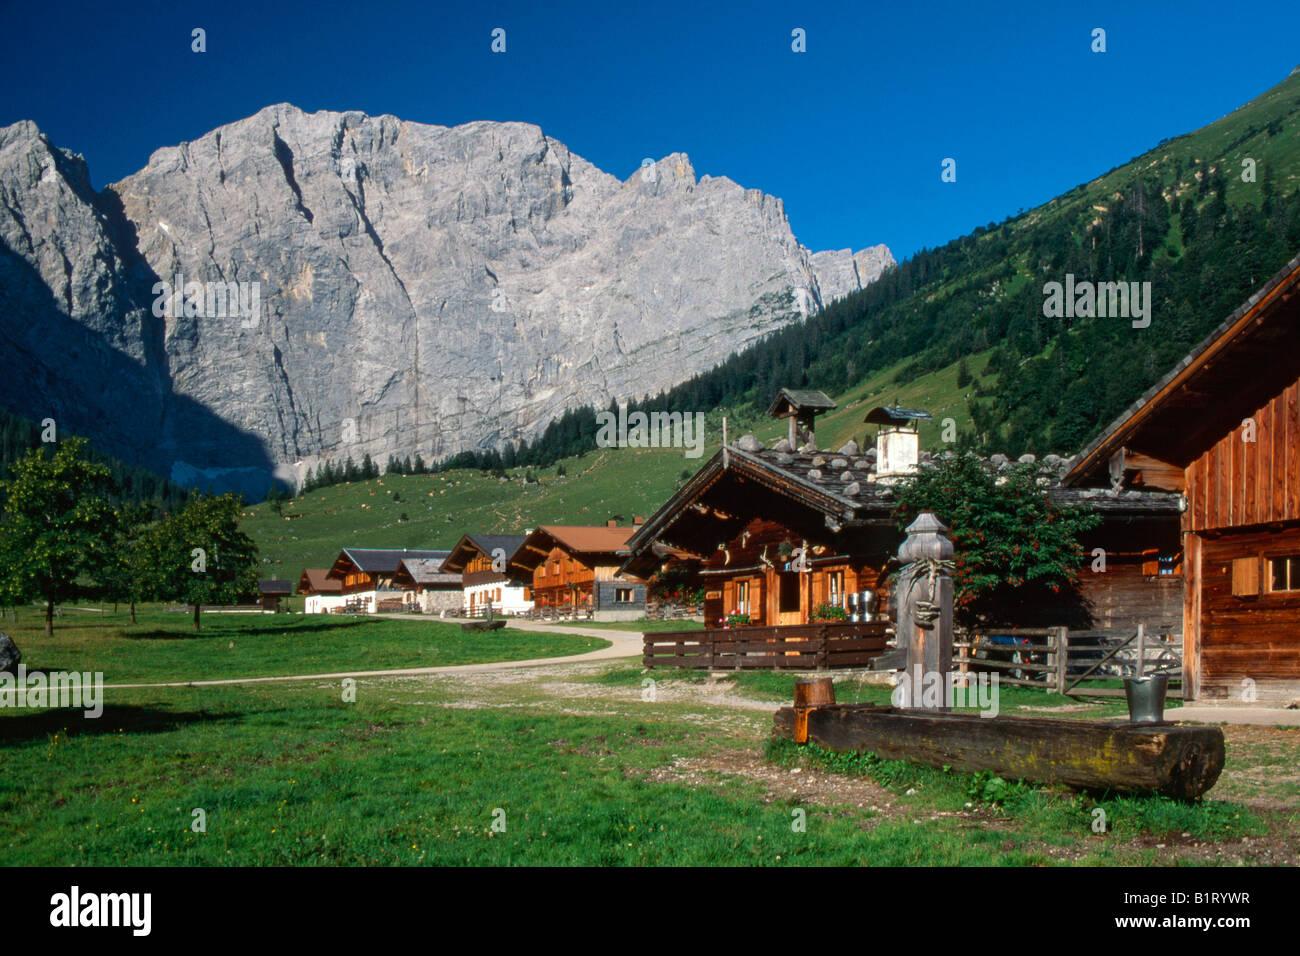 Eng-Alm alpine pasture, Karwendel Range, Schwaz, Tyrol, Austria, Europe - Stock Image